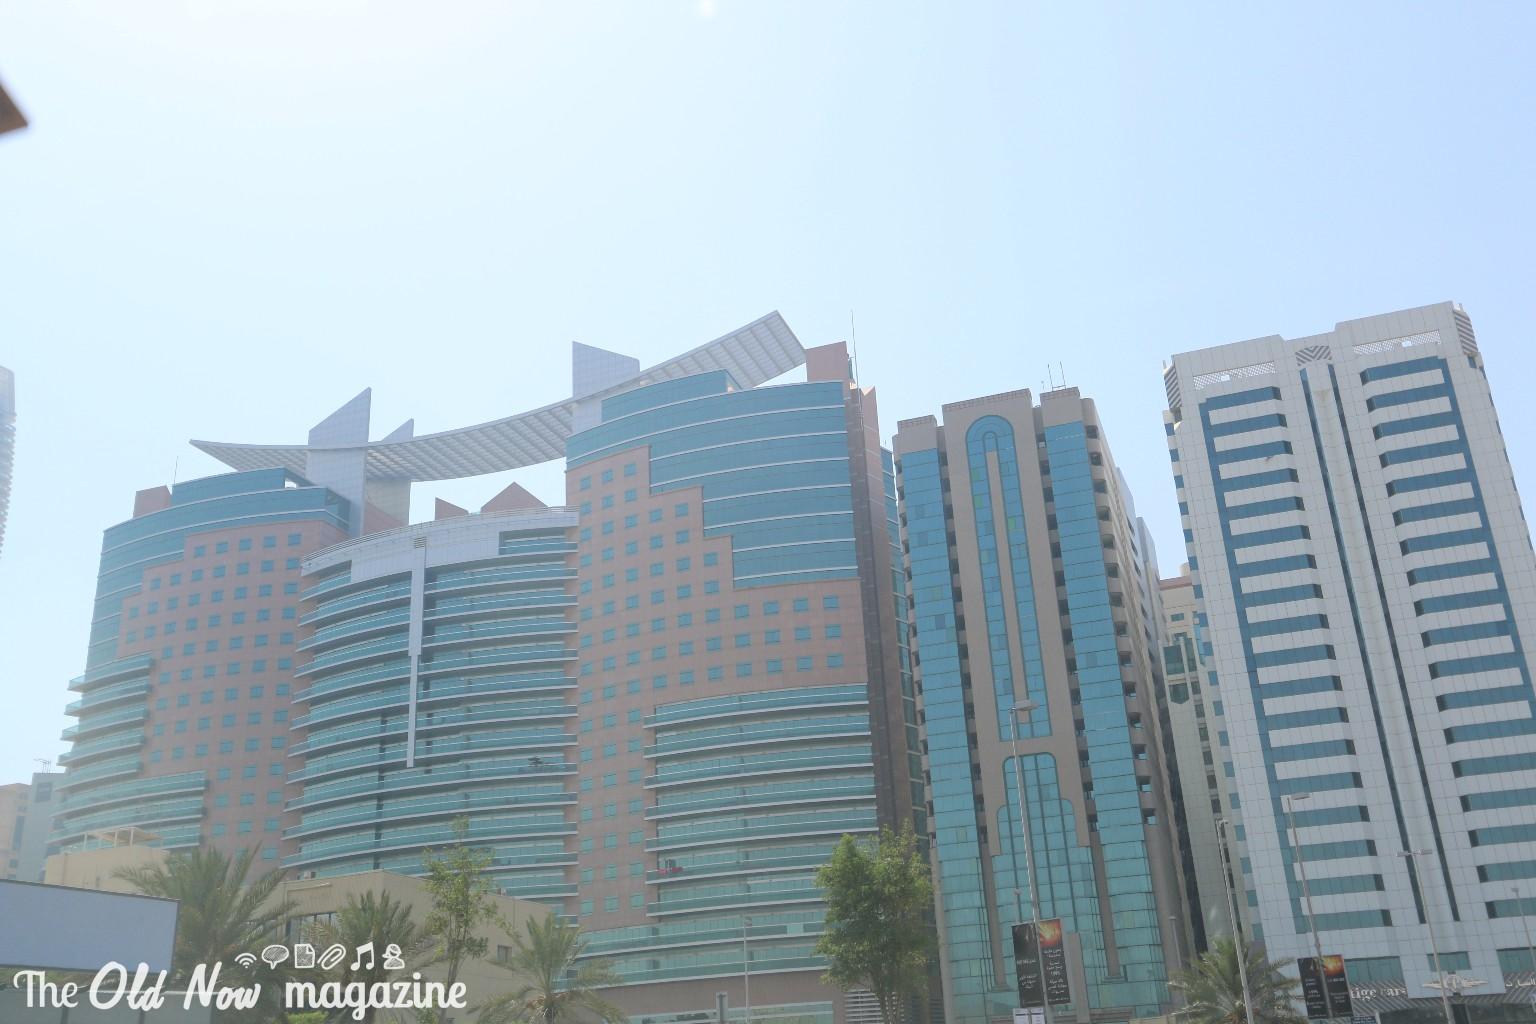 Abu Dhabi THEOLDNOW (10)